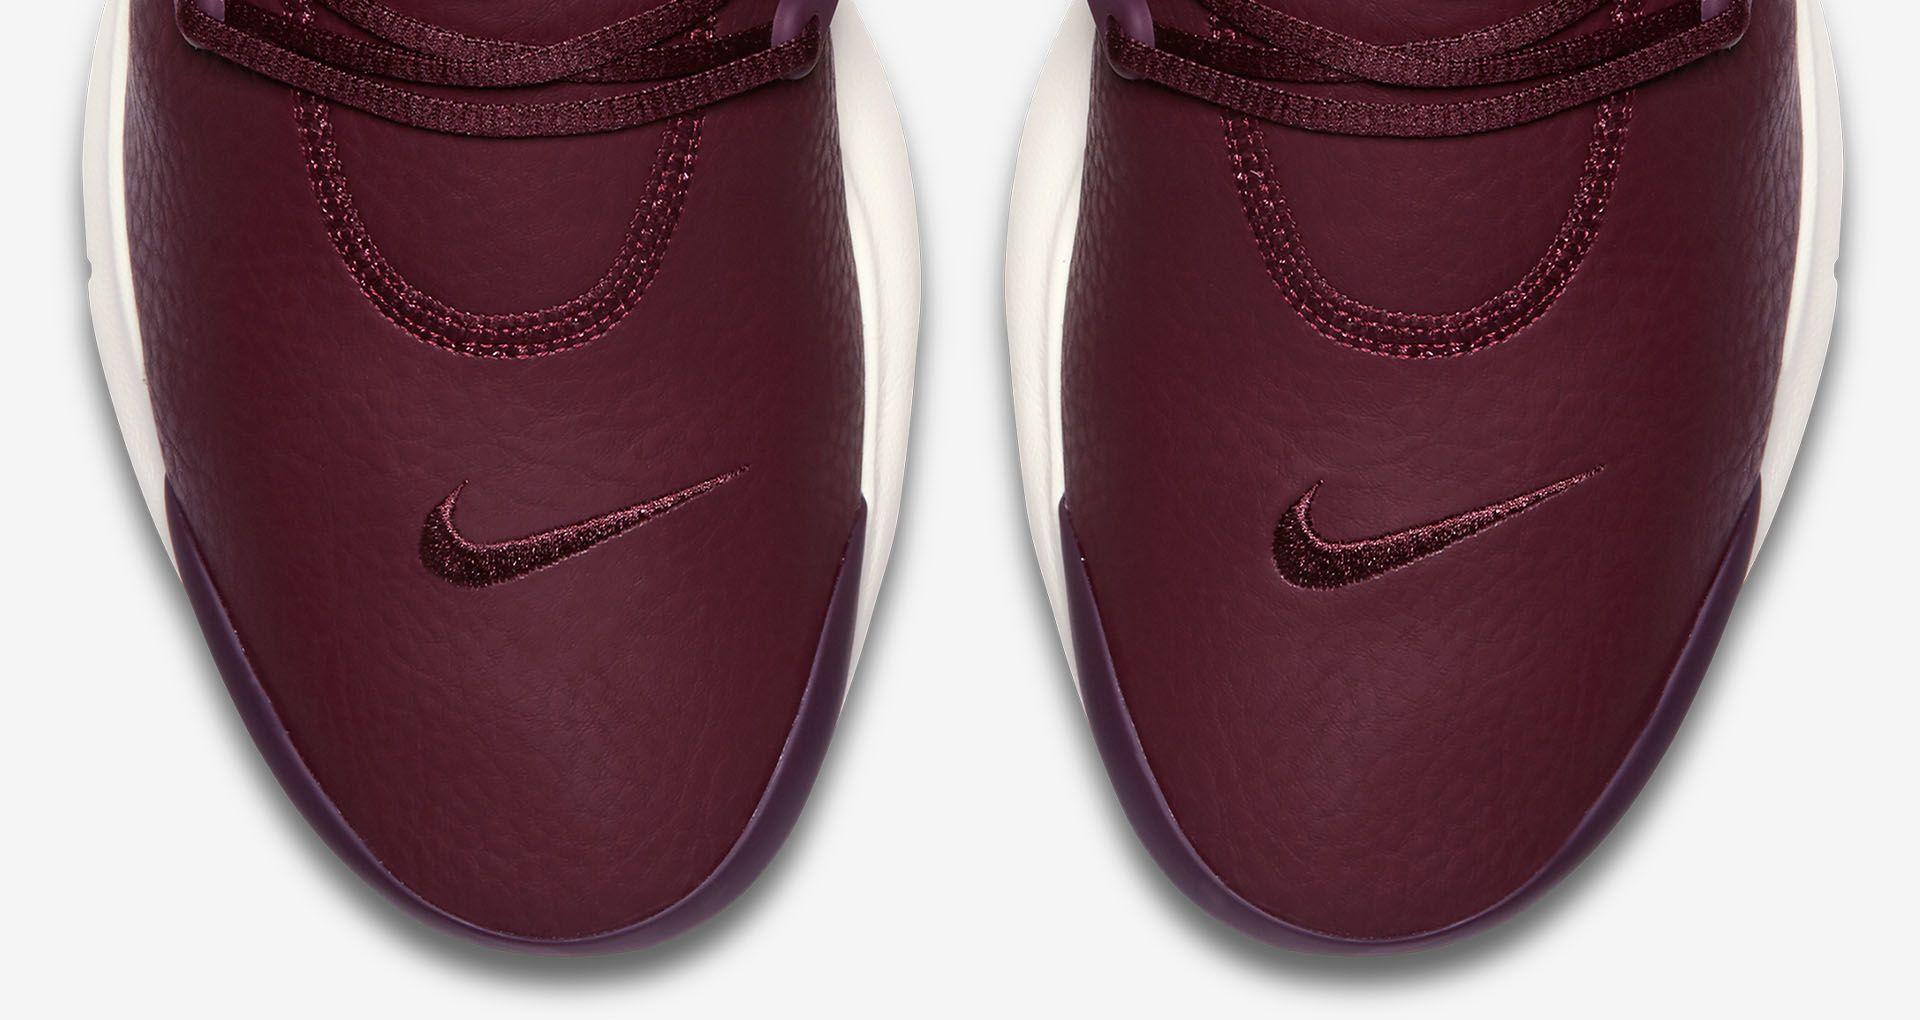 new styles 4de2d 10a05 Women's Nike Air Presto Premium 'Night Maroon'. Nike+ SNKRS